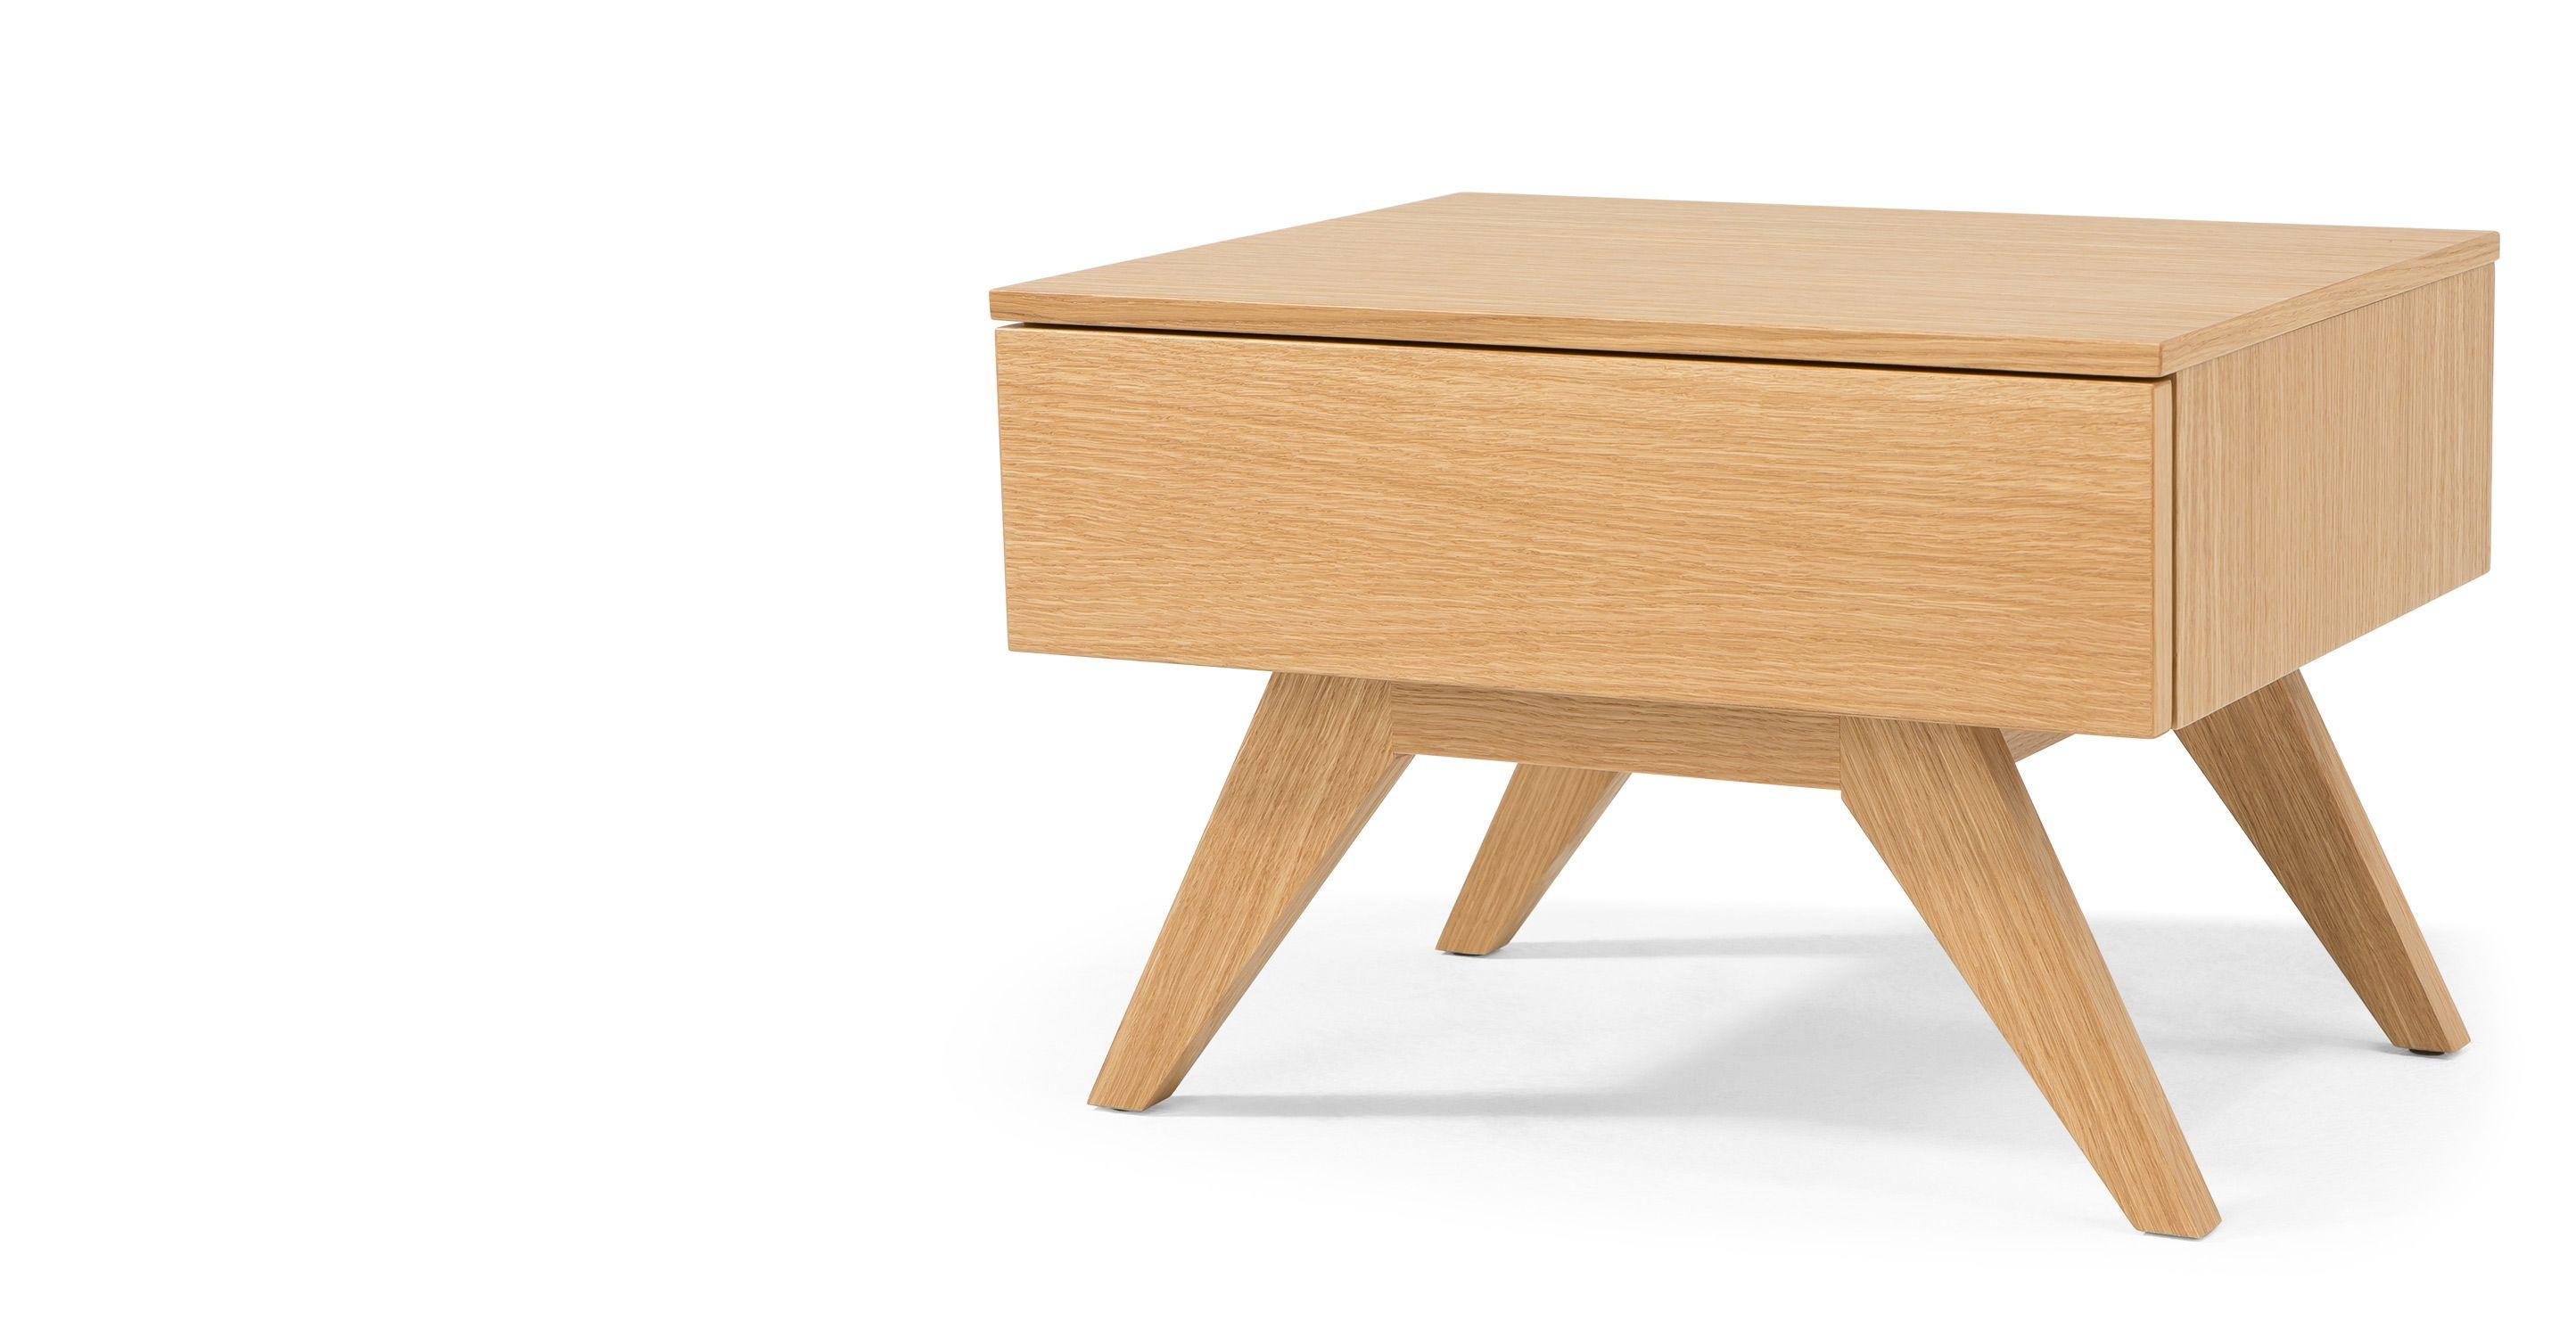 Olsen Une Table De Chevet Chene Made Com Table De Chevet Chene Mobilier De Salon